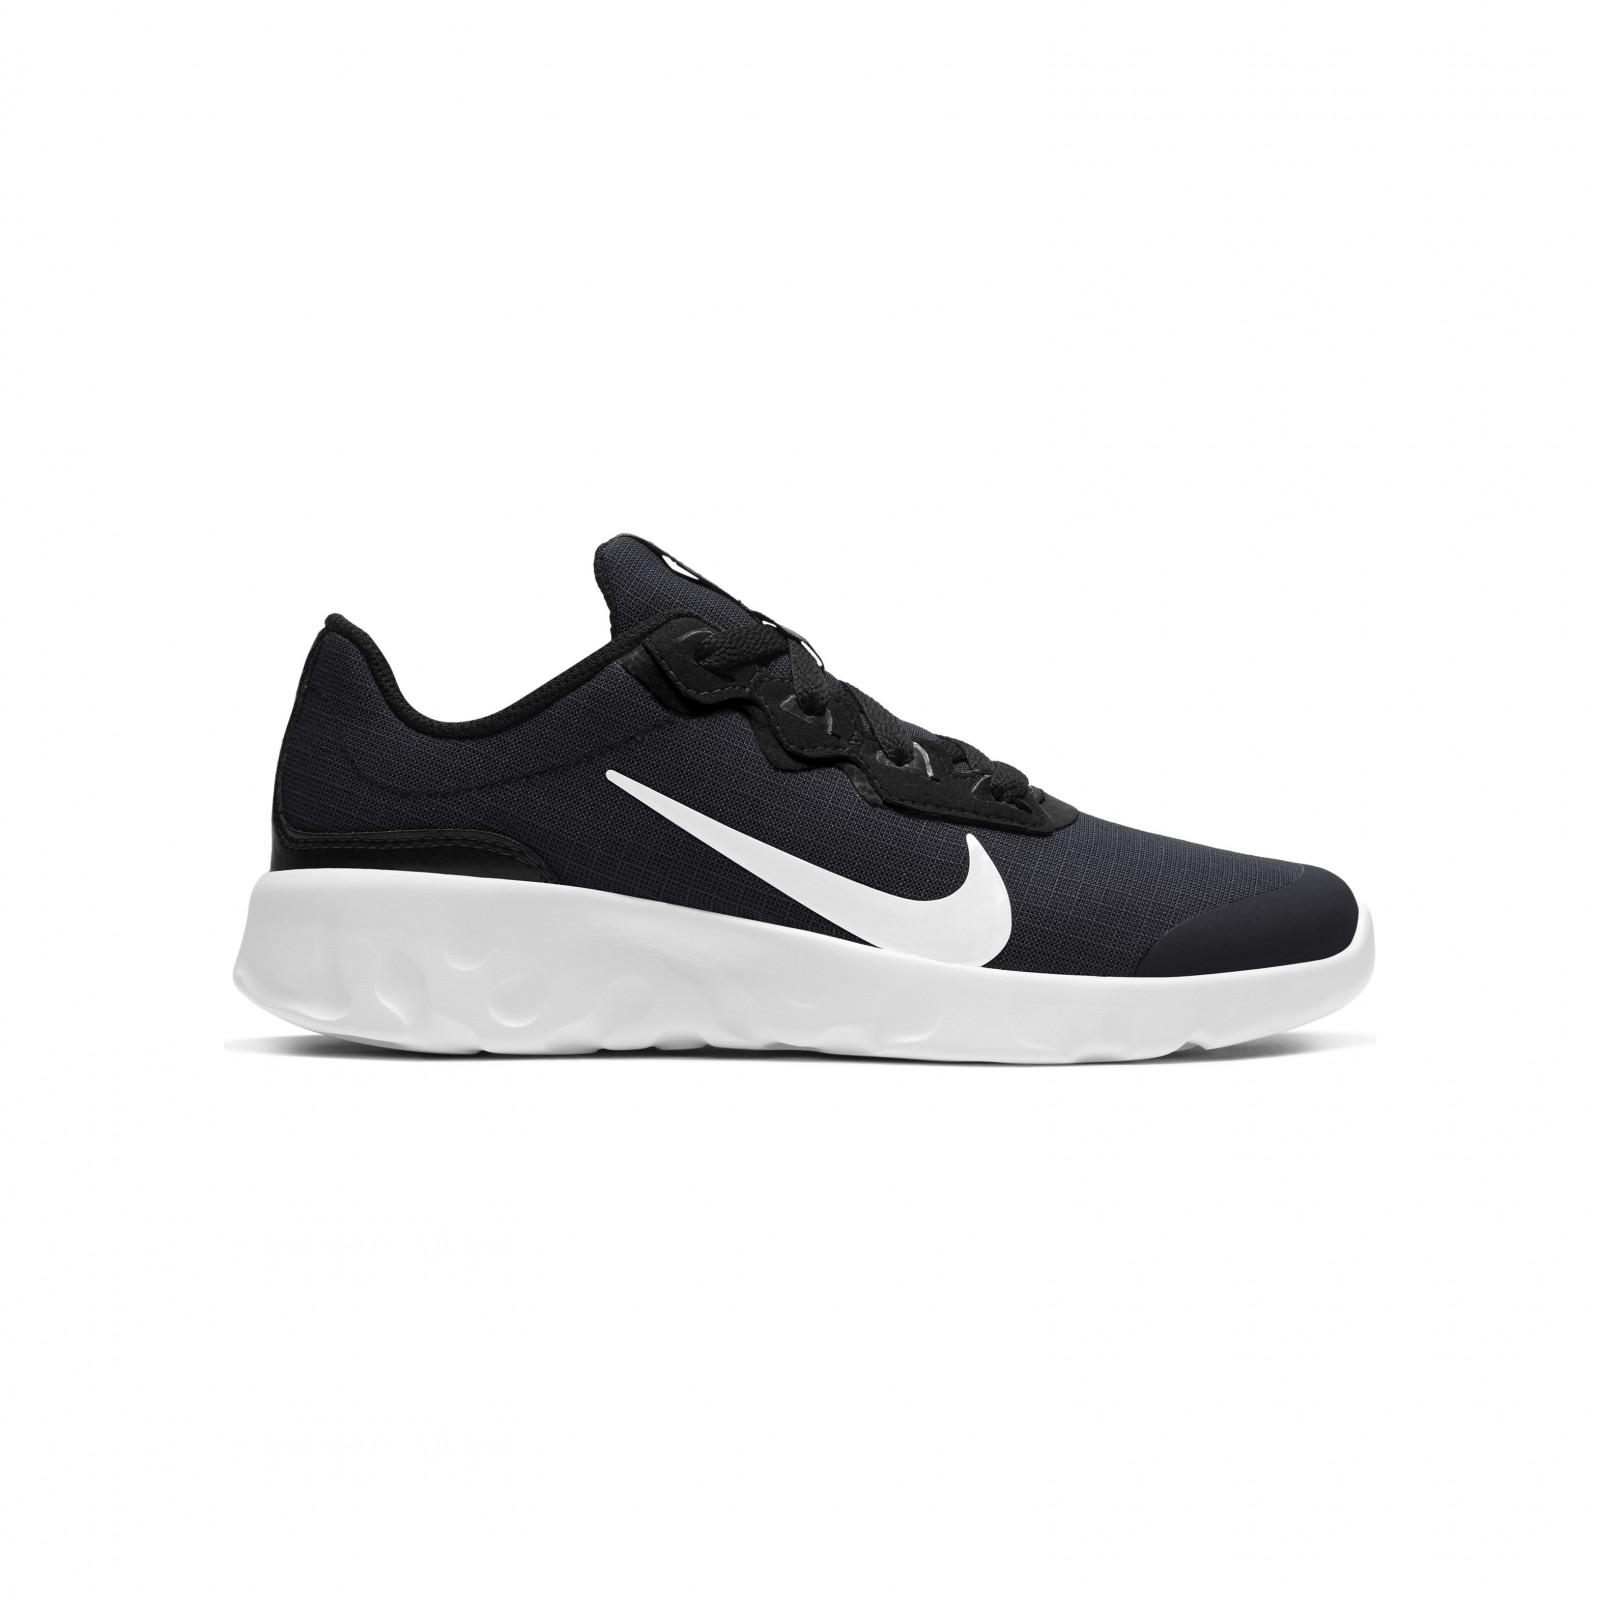 Nike explore strada (gs) BLACK/WHITE-ANTHRACITE